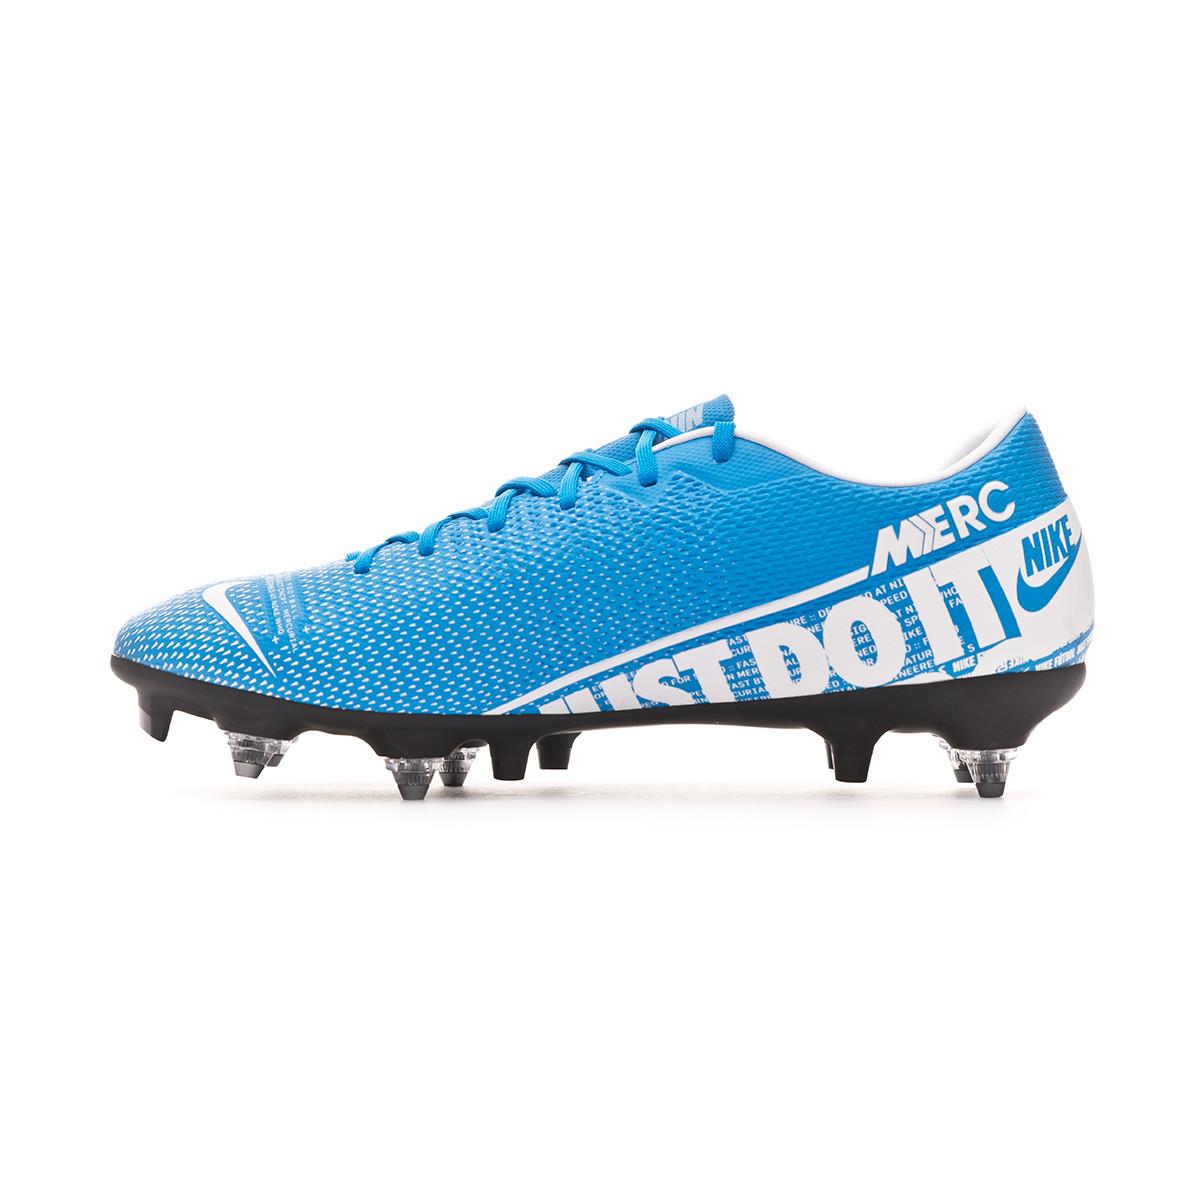 Nike Mercurial Vapor XIII Academy ACC SG,Pro Football Boots